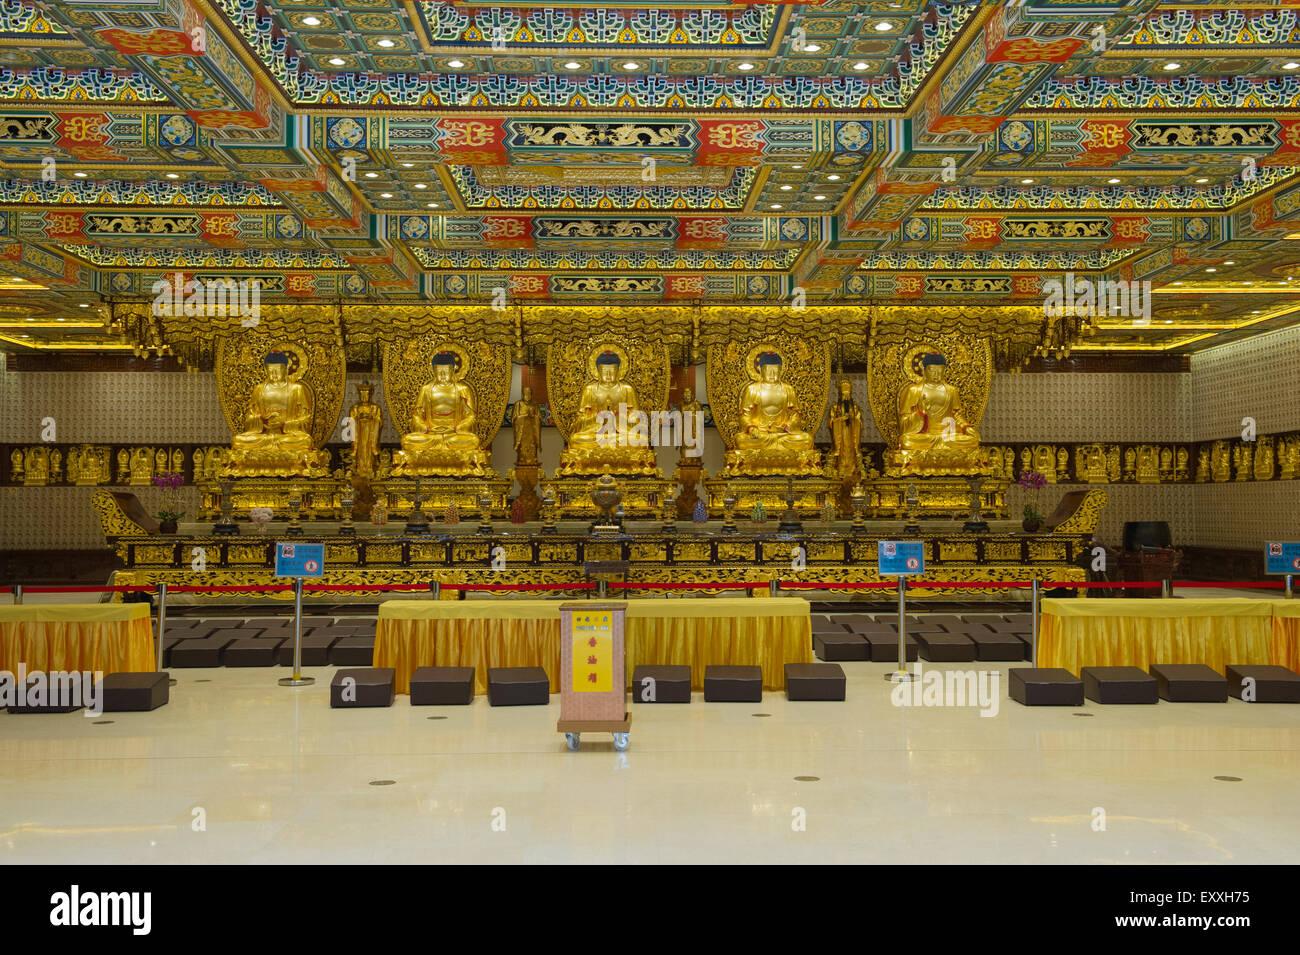 Grand Hall Of Ten Thousand Buddhas interior, Po Lin Monastery, Lantau Island Hong Kong, China Stock Photo